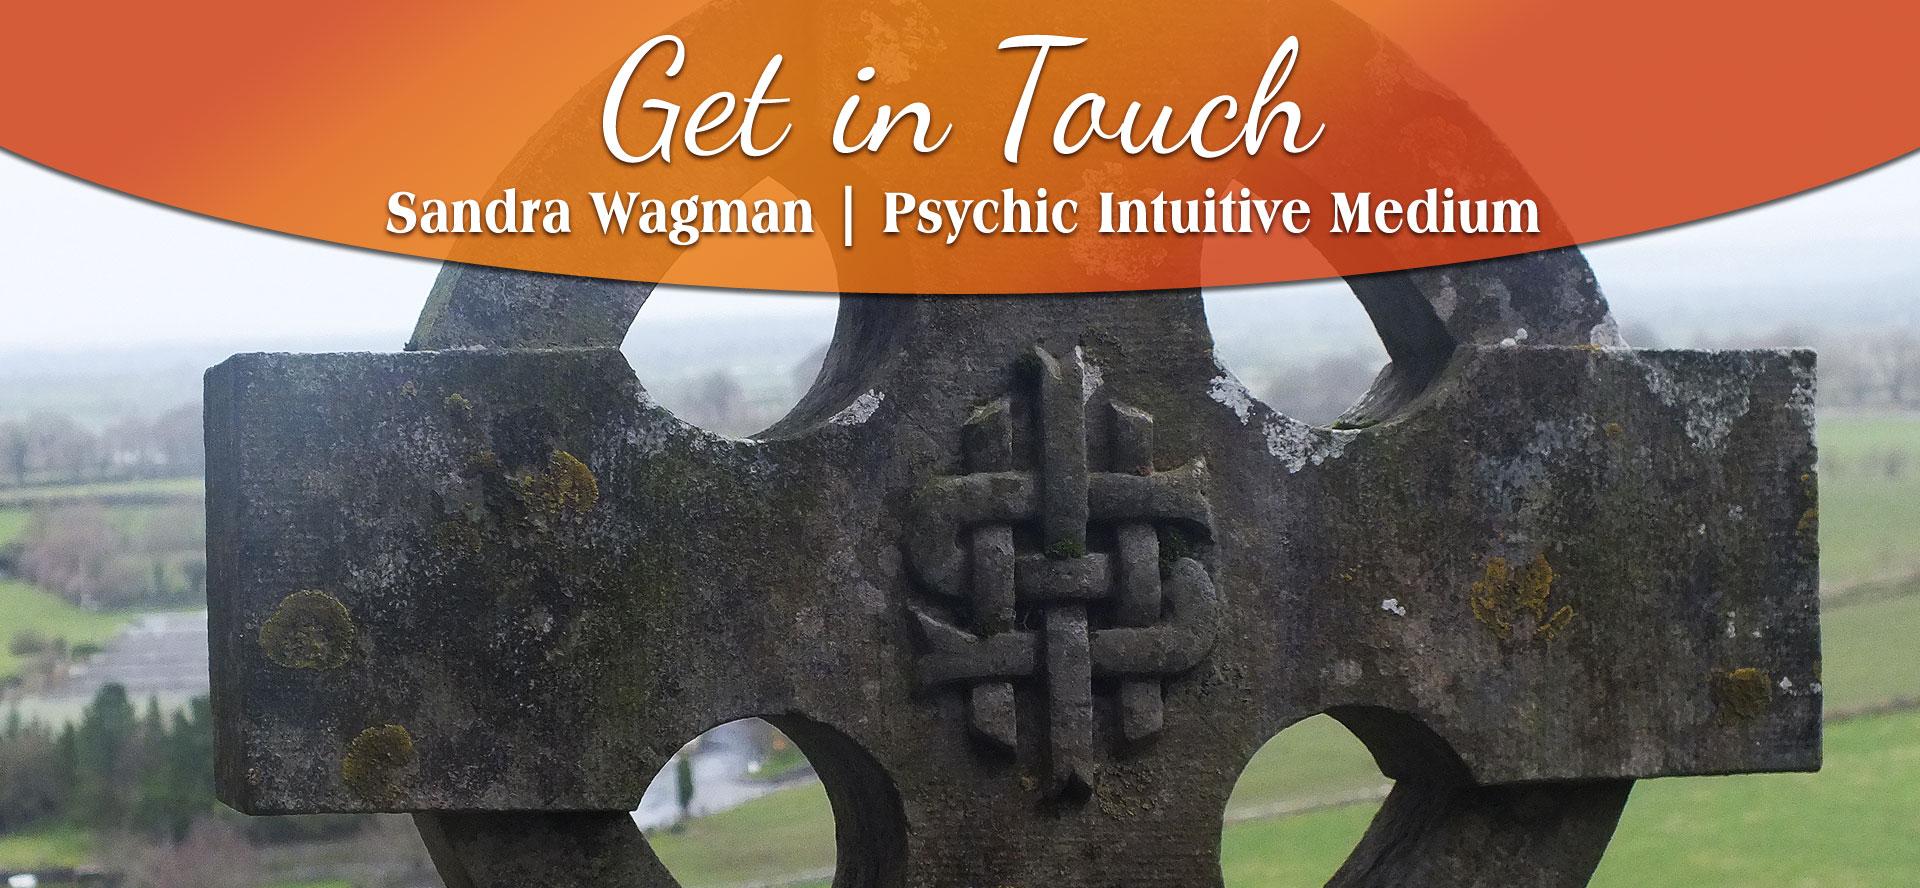 Sandra Wagman | Psychic Intuitive Medium